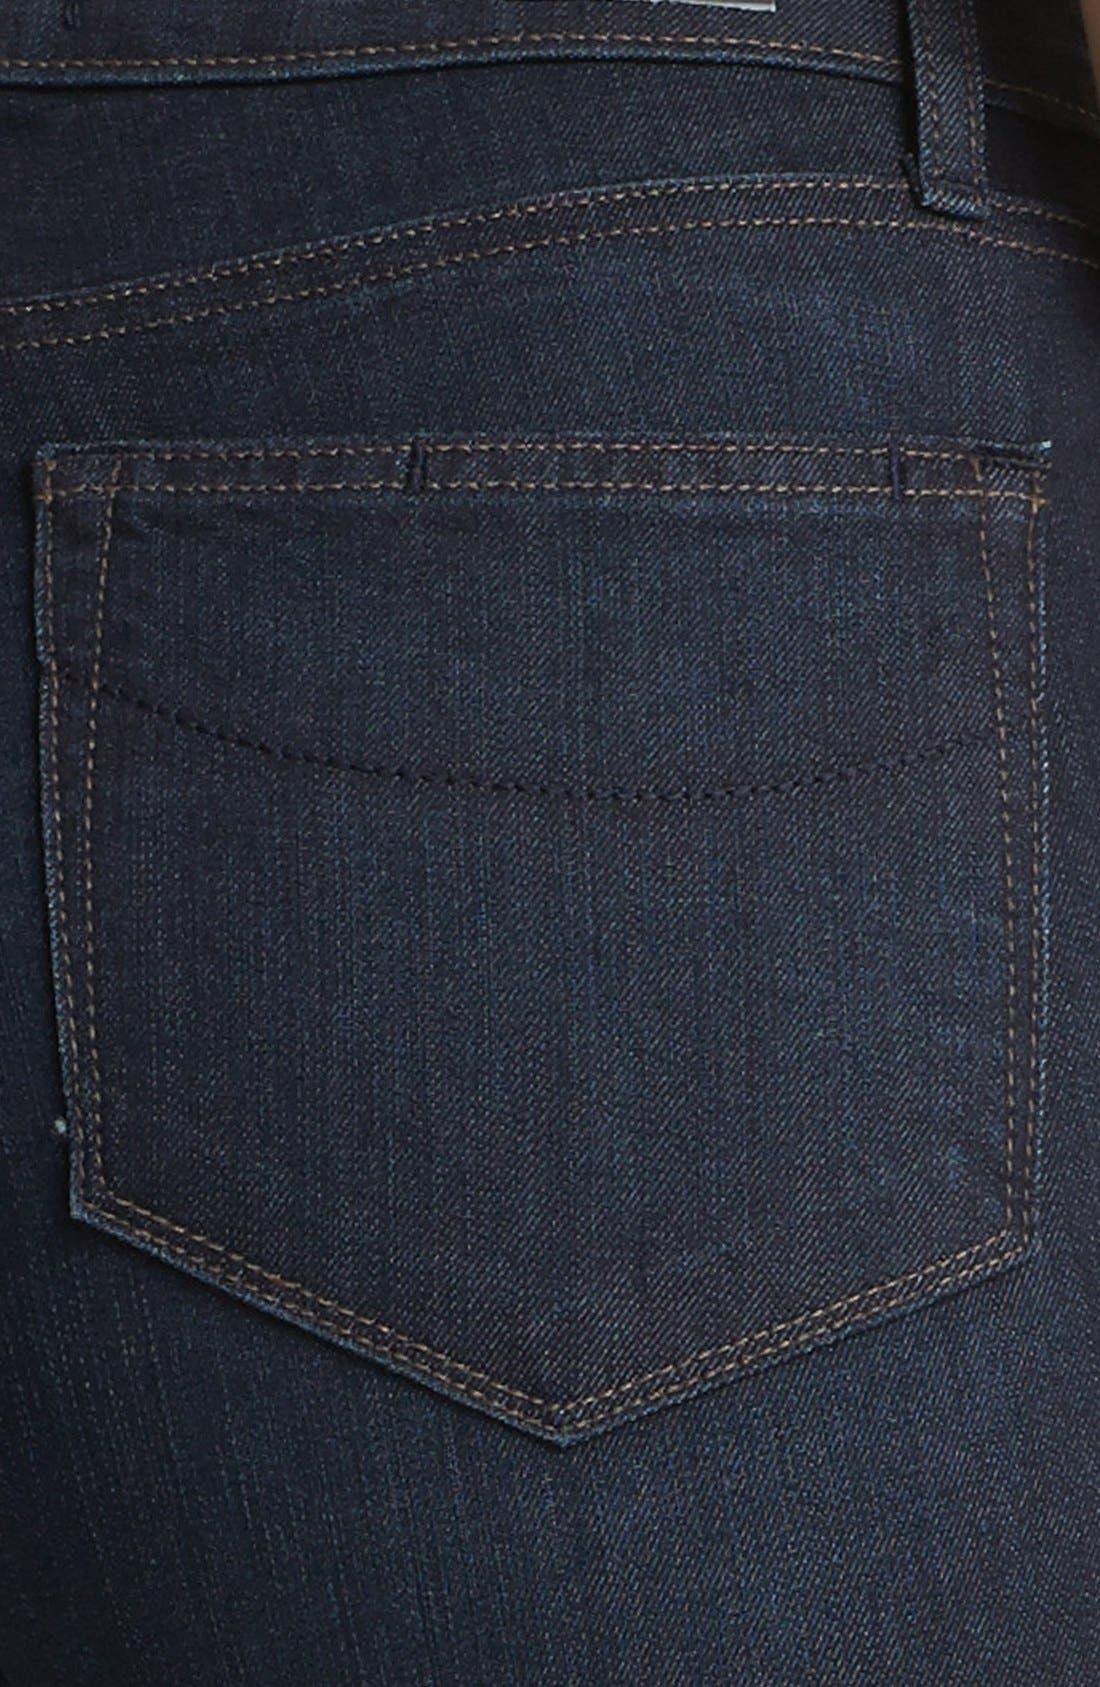 Denim 'Hoxton' High Rise Straight Leg Jeans,                             Alternate thumbnail 2, color,                             400